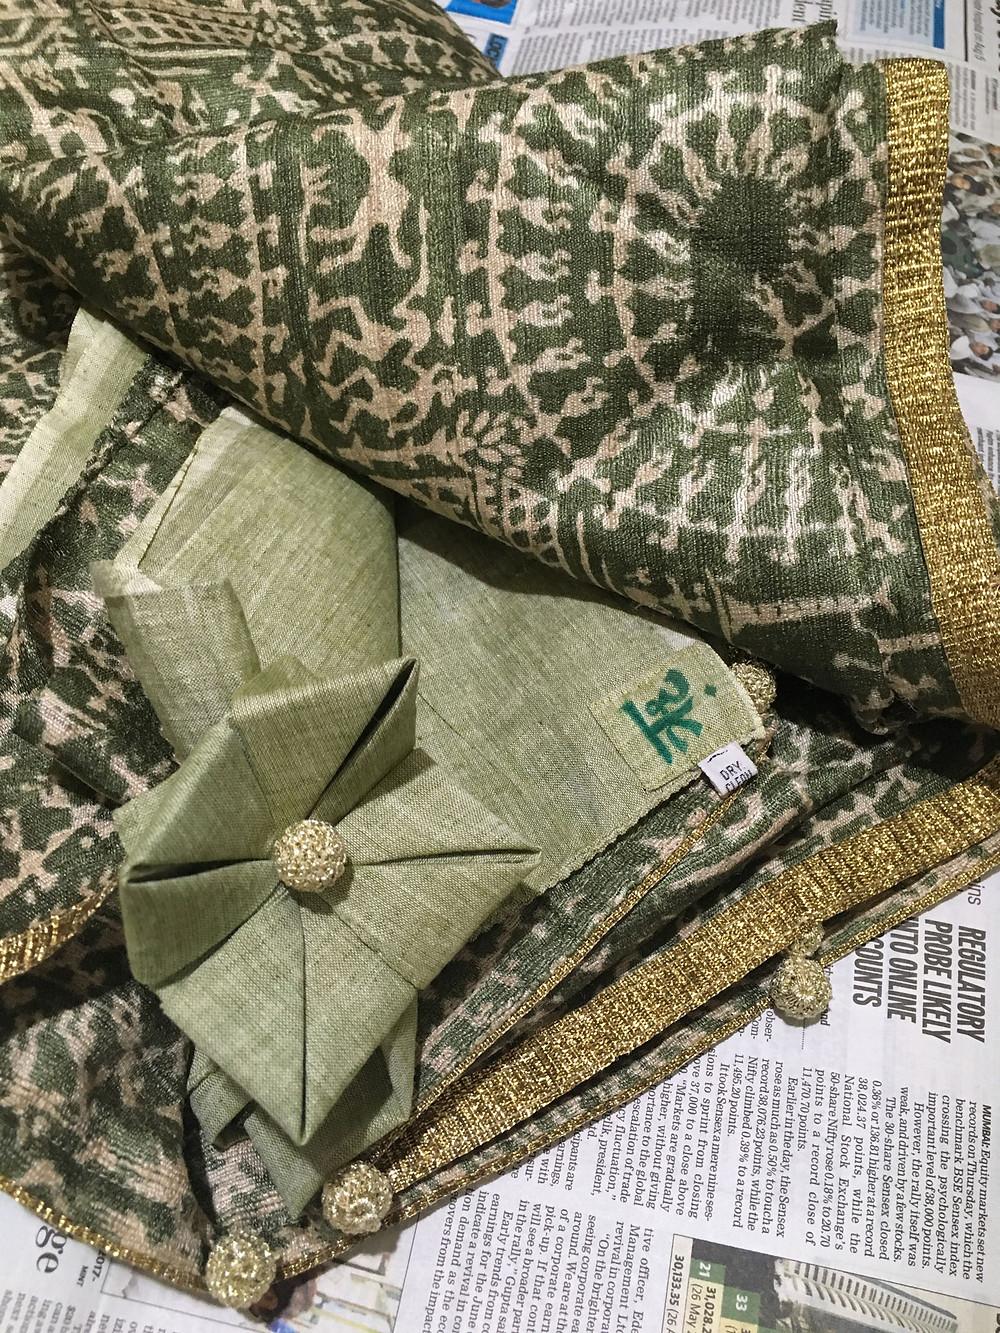 Samoolam crochet trims and leftover tape